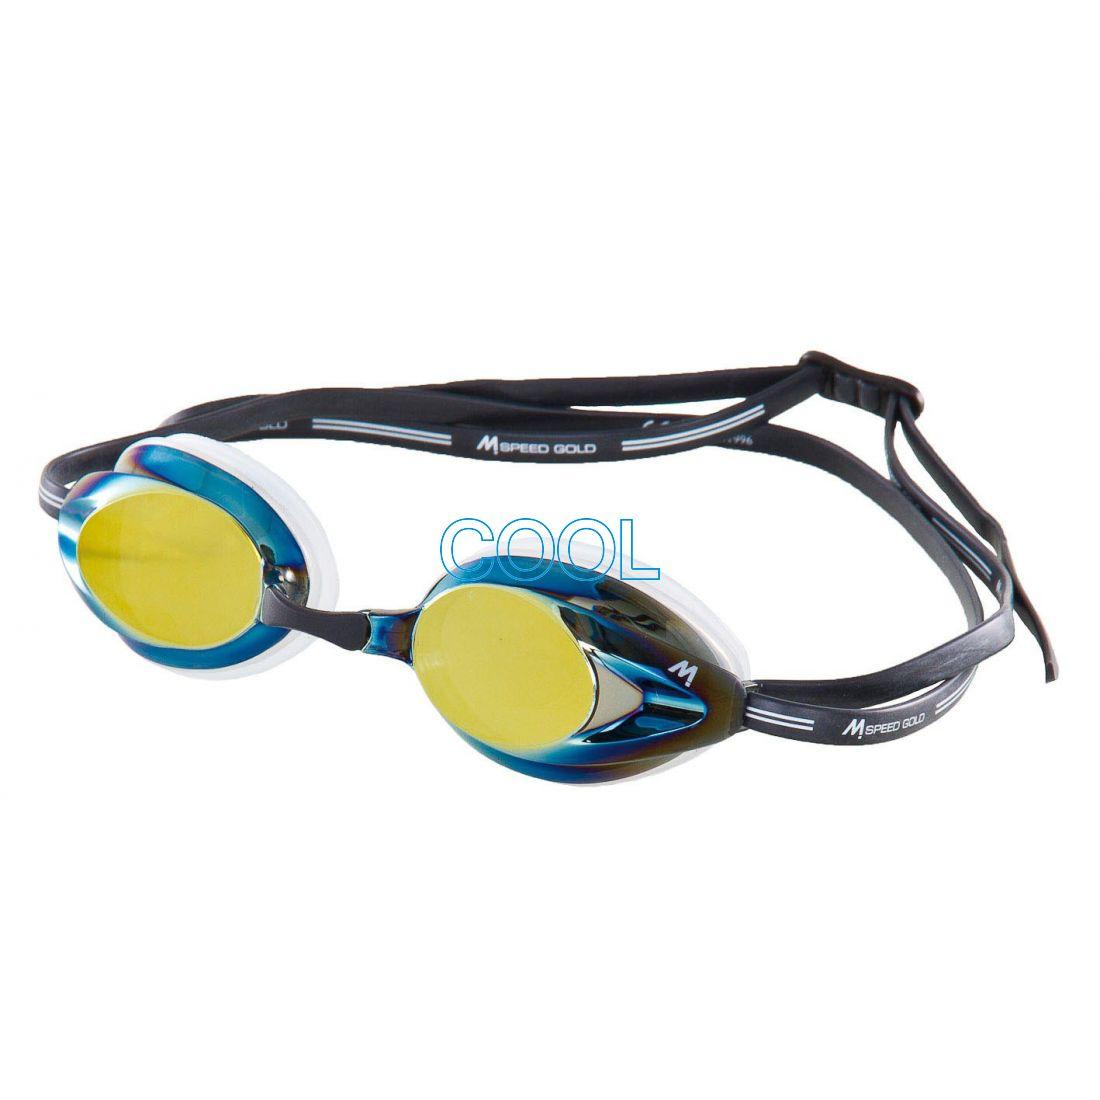 8d2ce596e cool - Plávanie - Okuliare - MOSCONI SPEED GOLD pretekárske plavecké ...